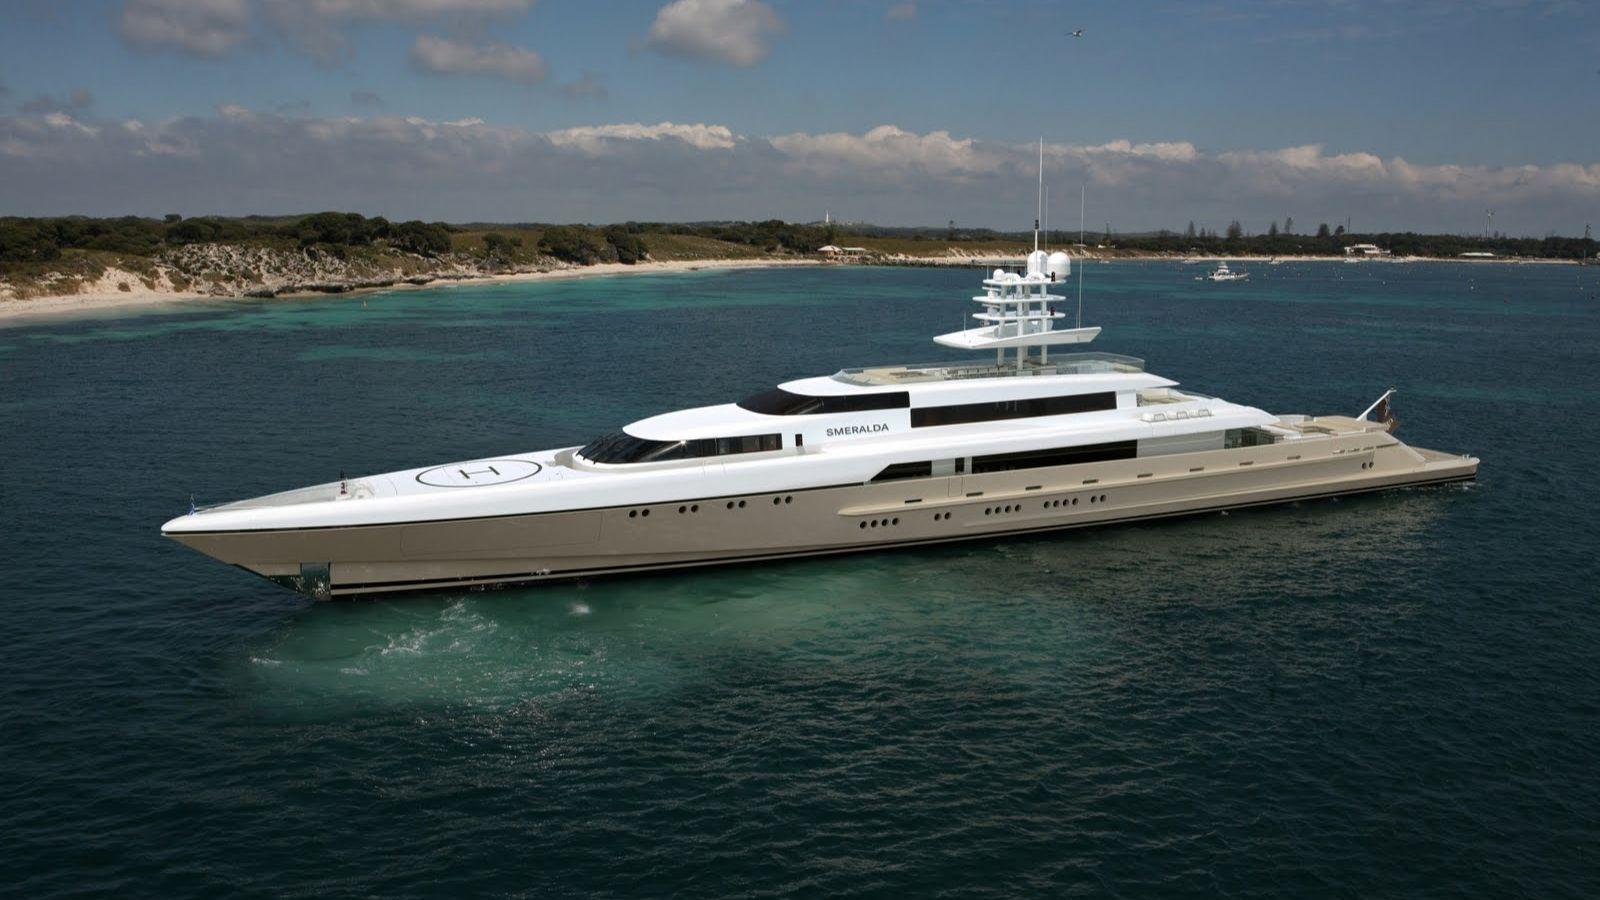 77m Superyacht Smeralda